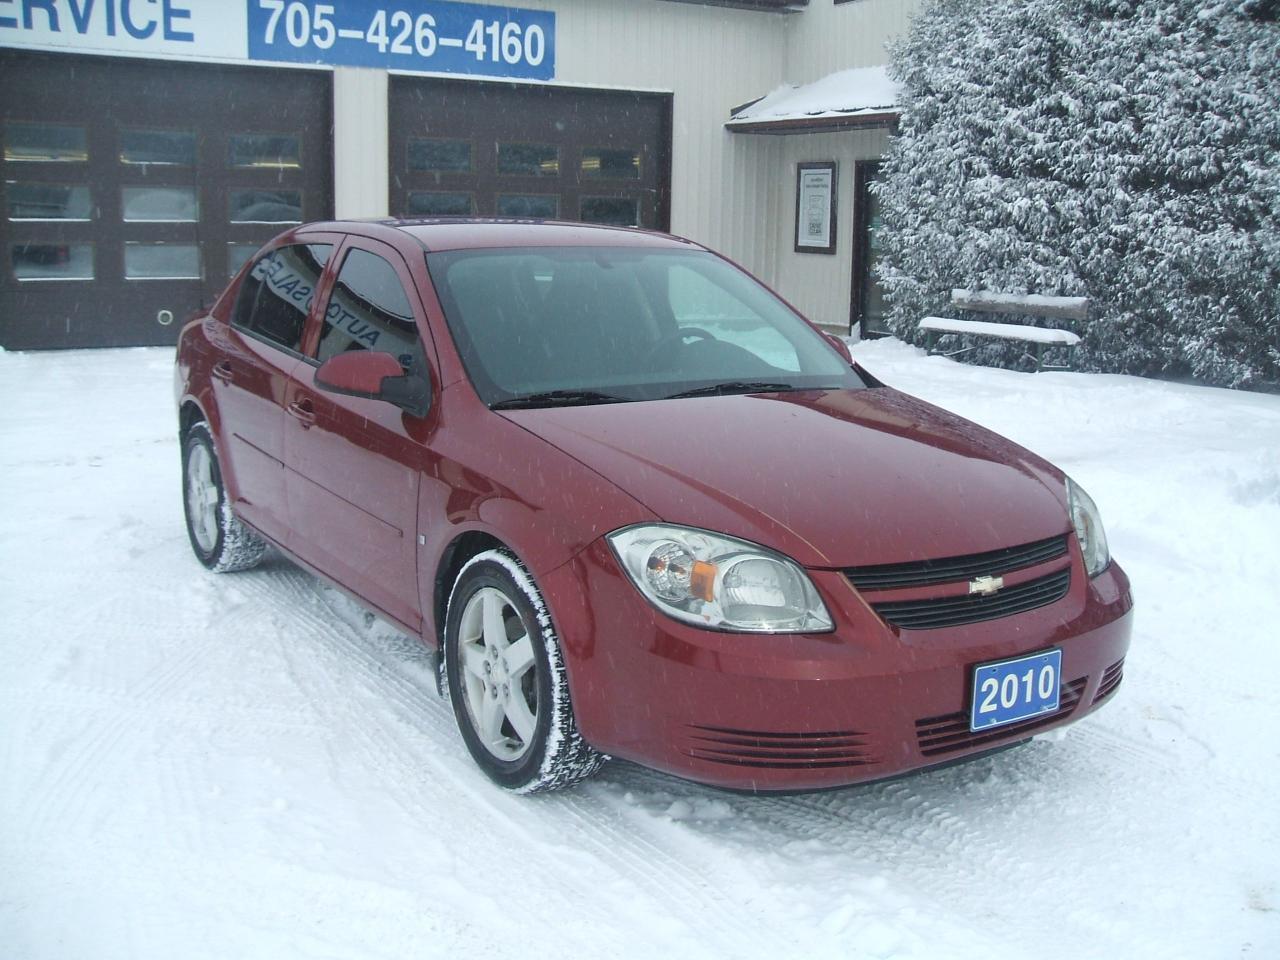 2010 Chevrolet Cobalt LT,